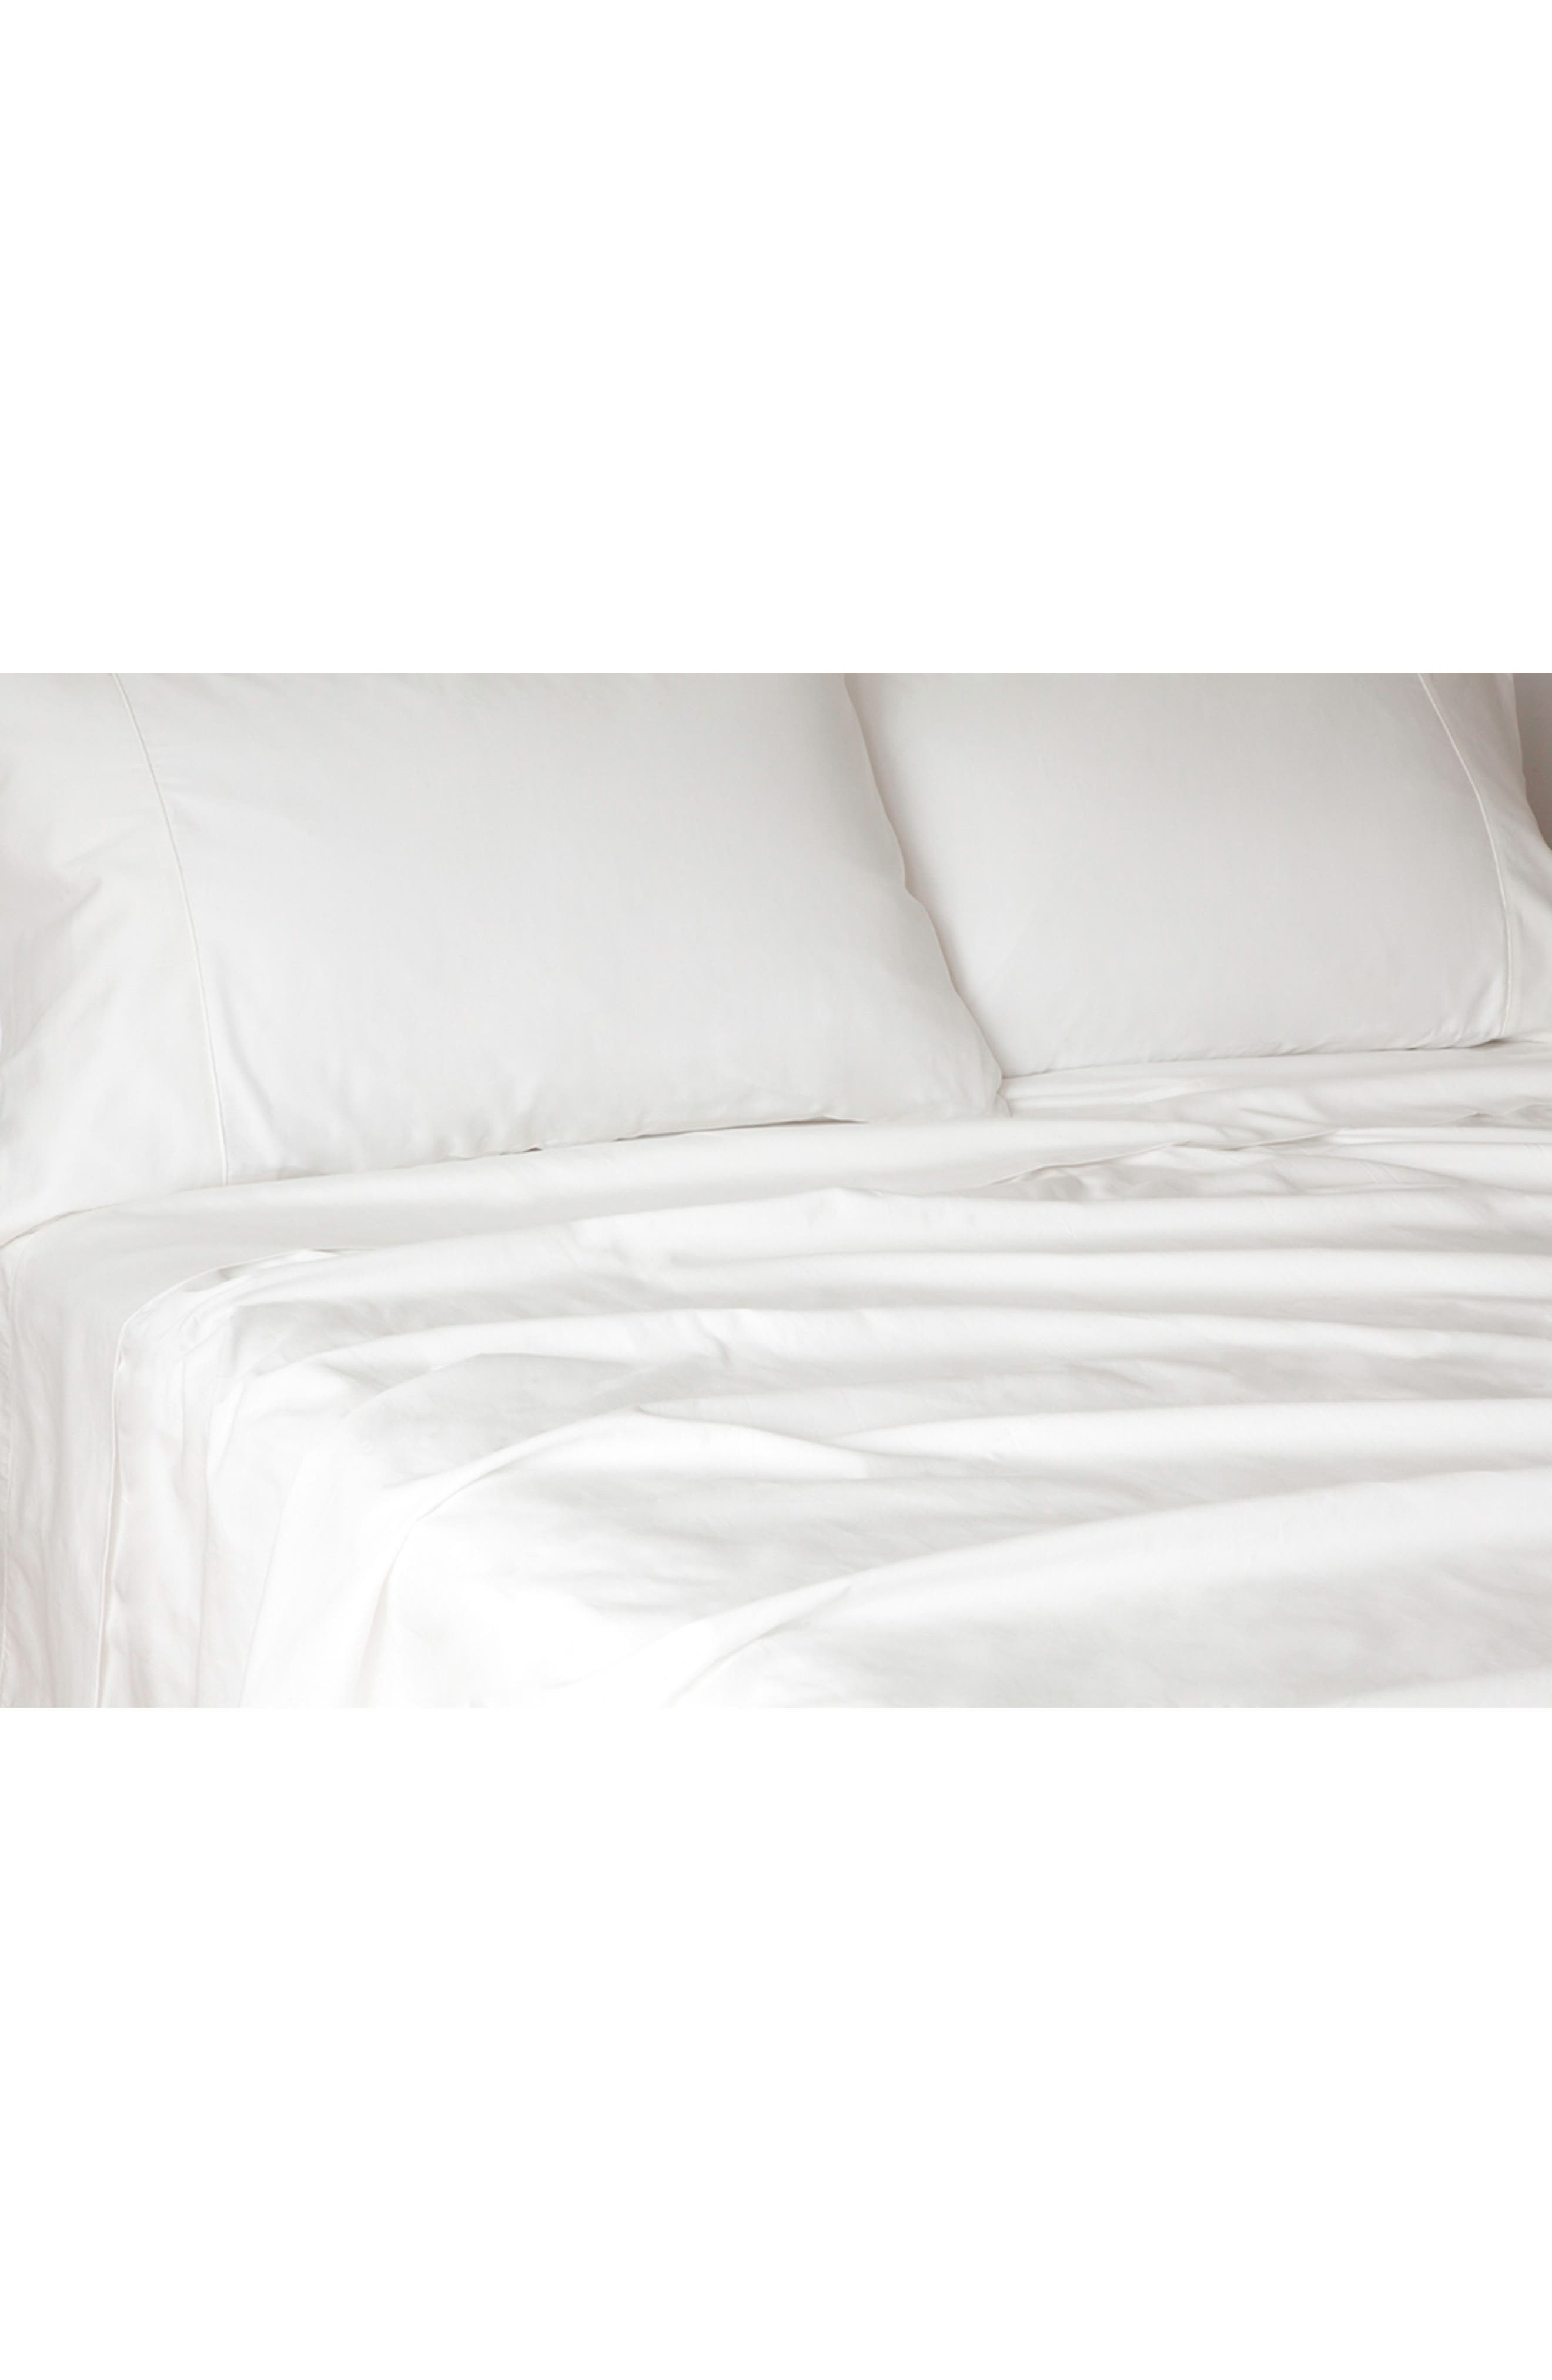 Main Image - Glo 300 Thread Count Organic Cotton Sateen Sheet Set